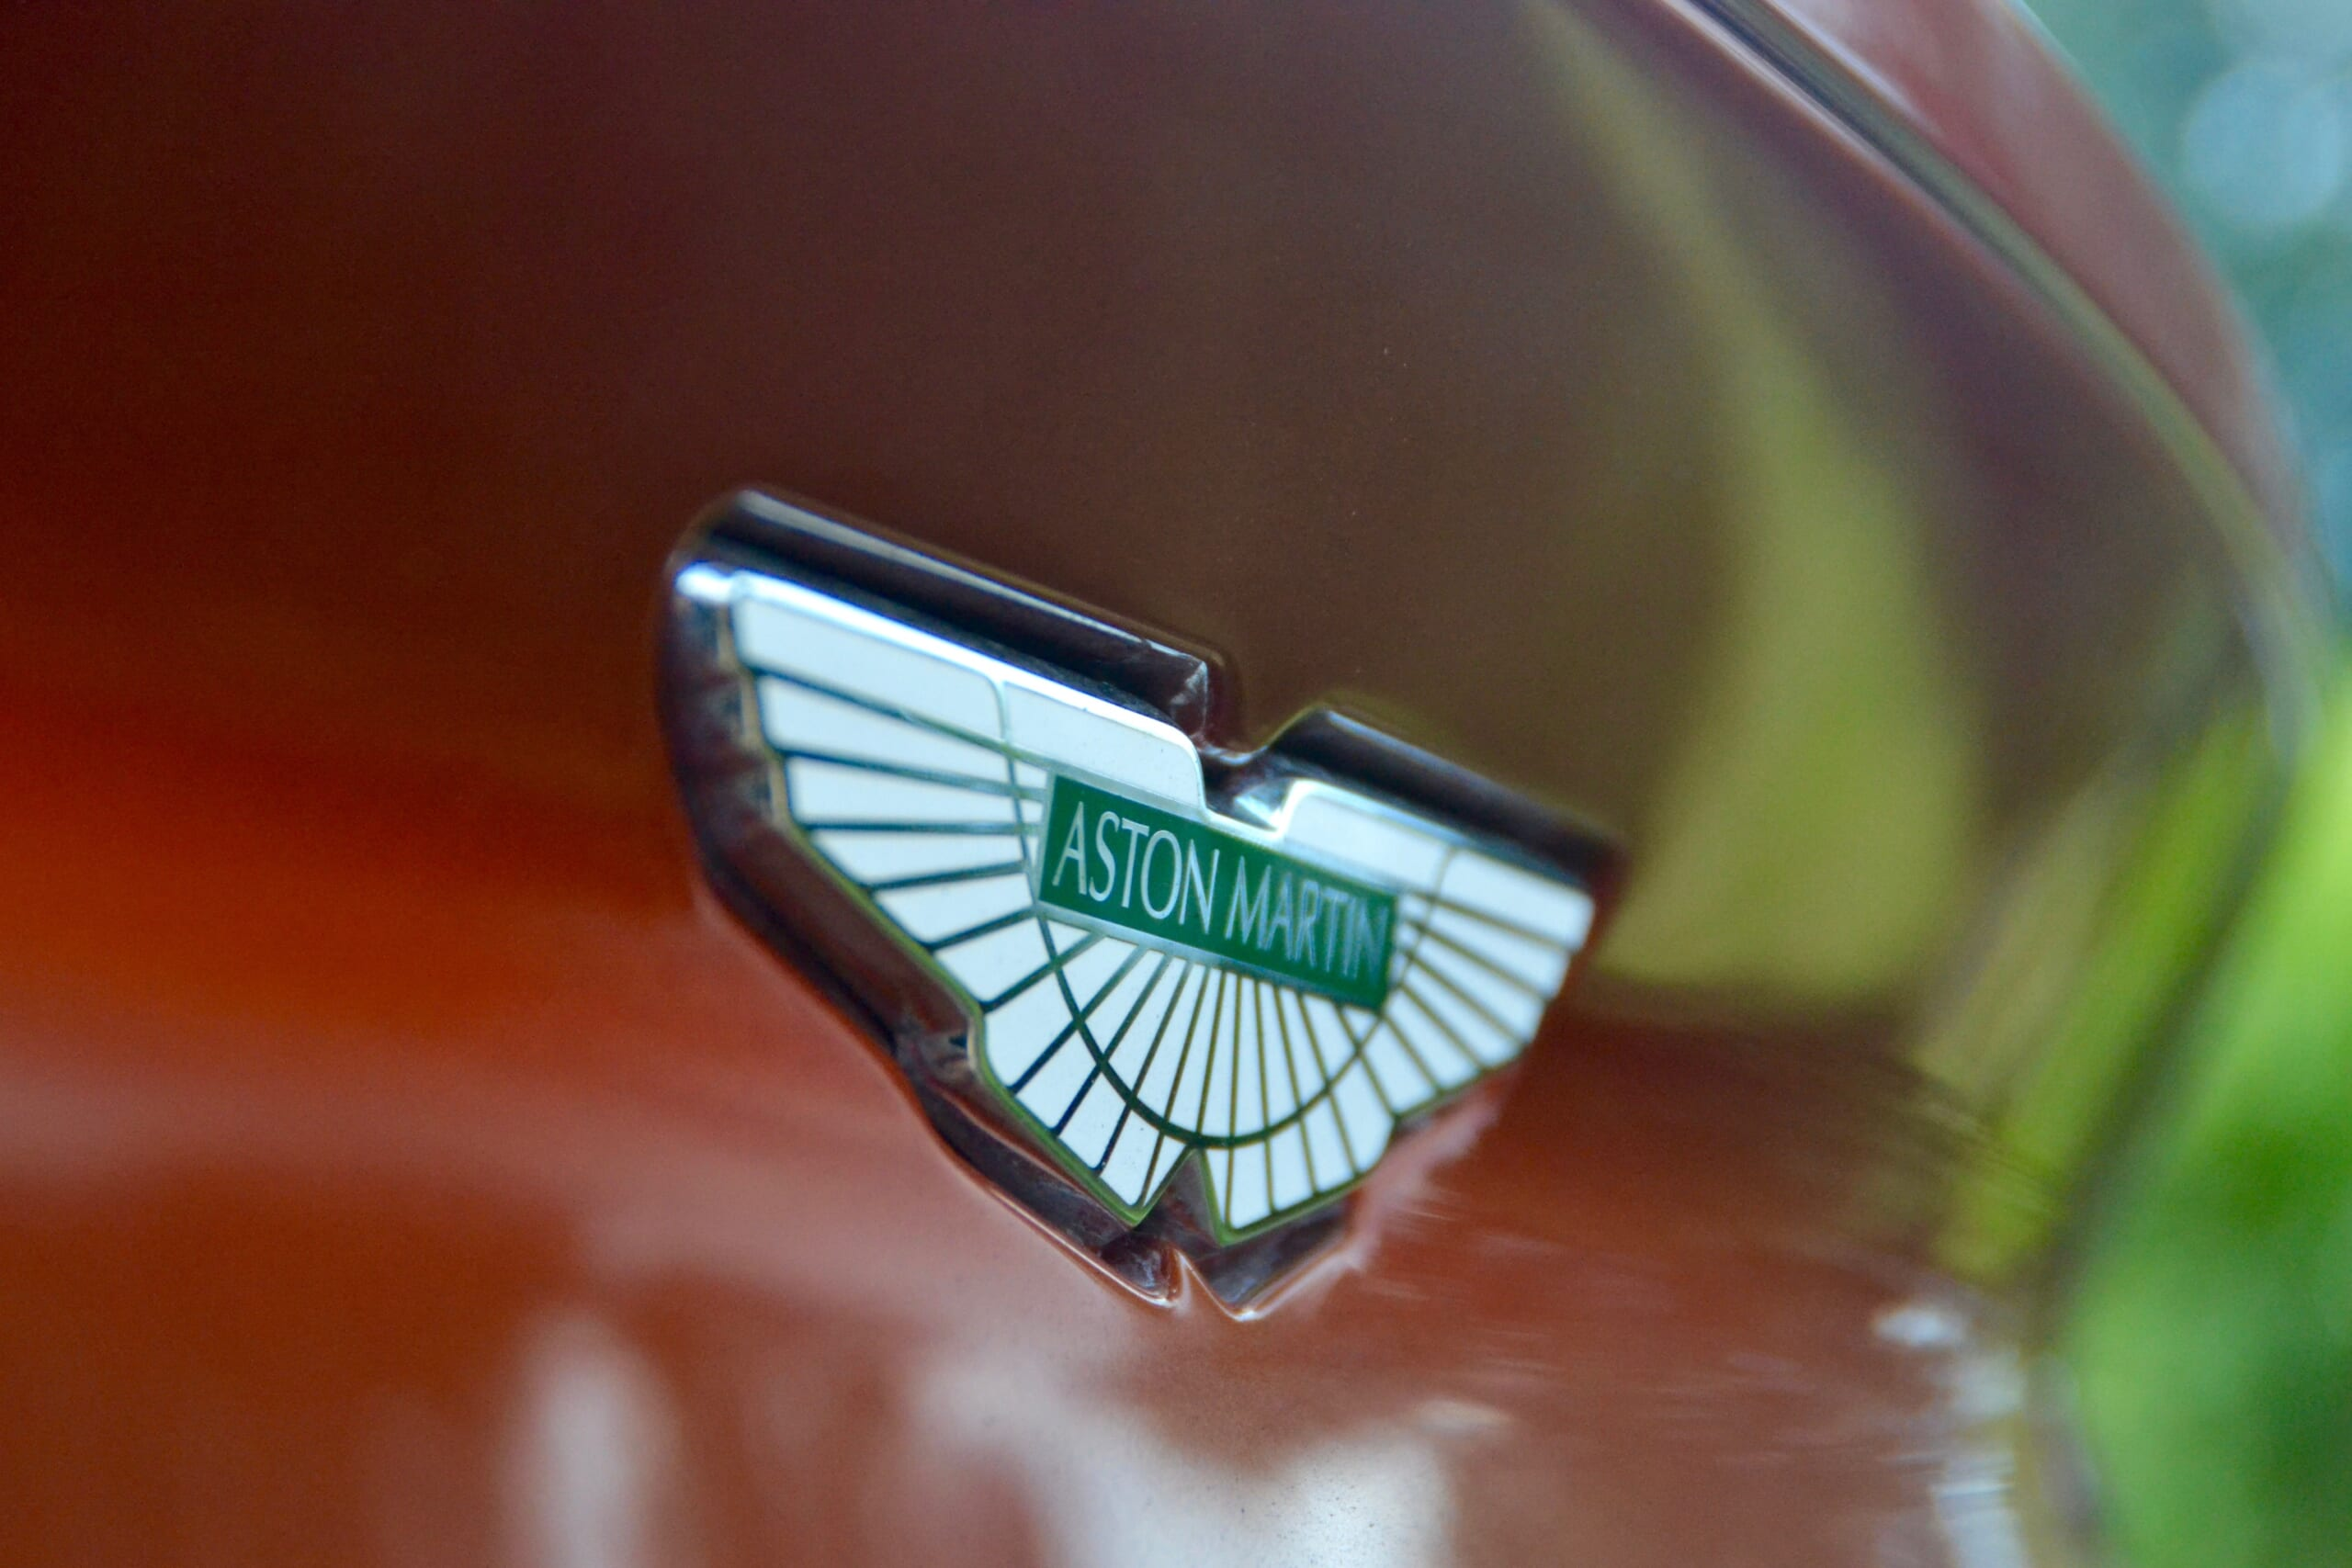 Aston Martin DB11 Photo: Dan Carney